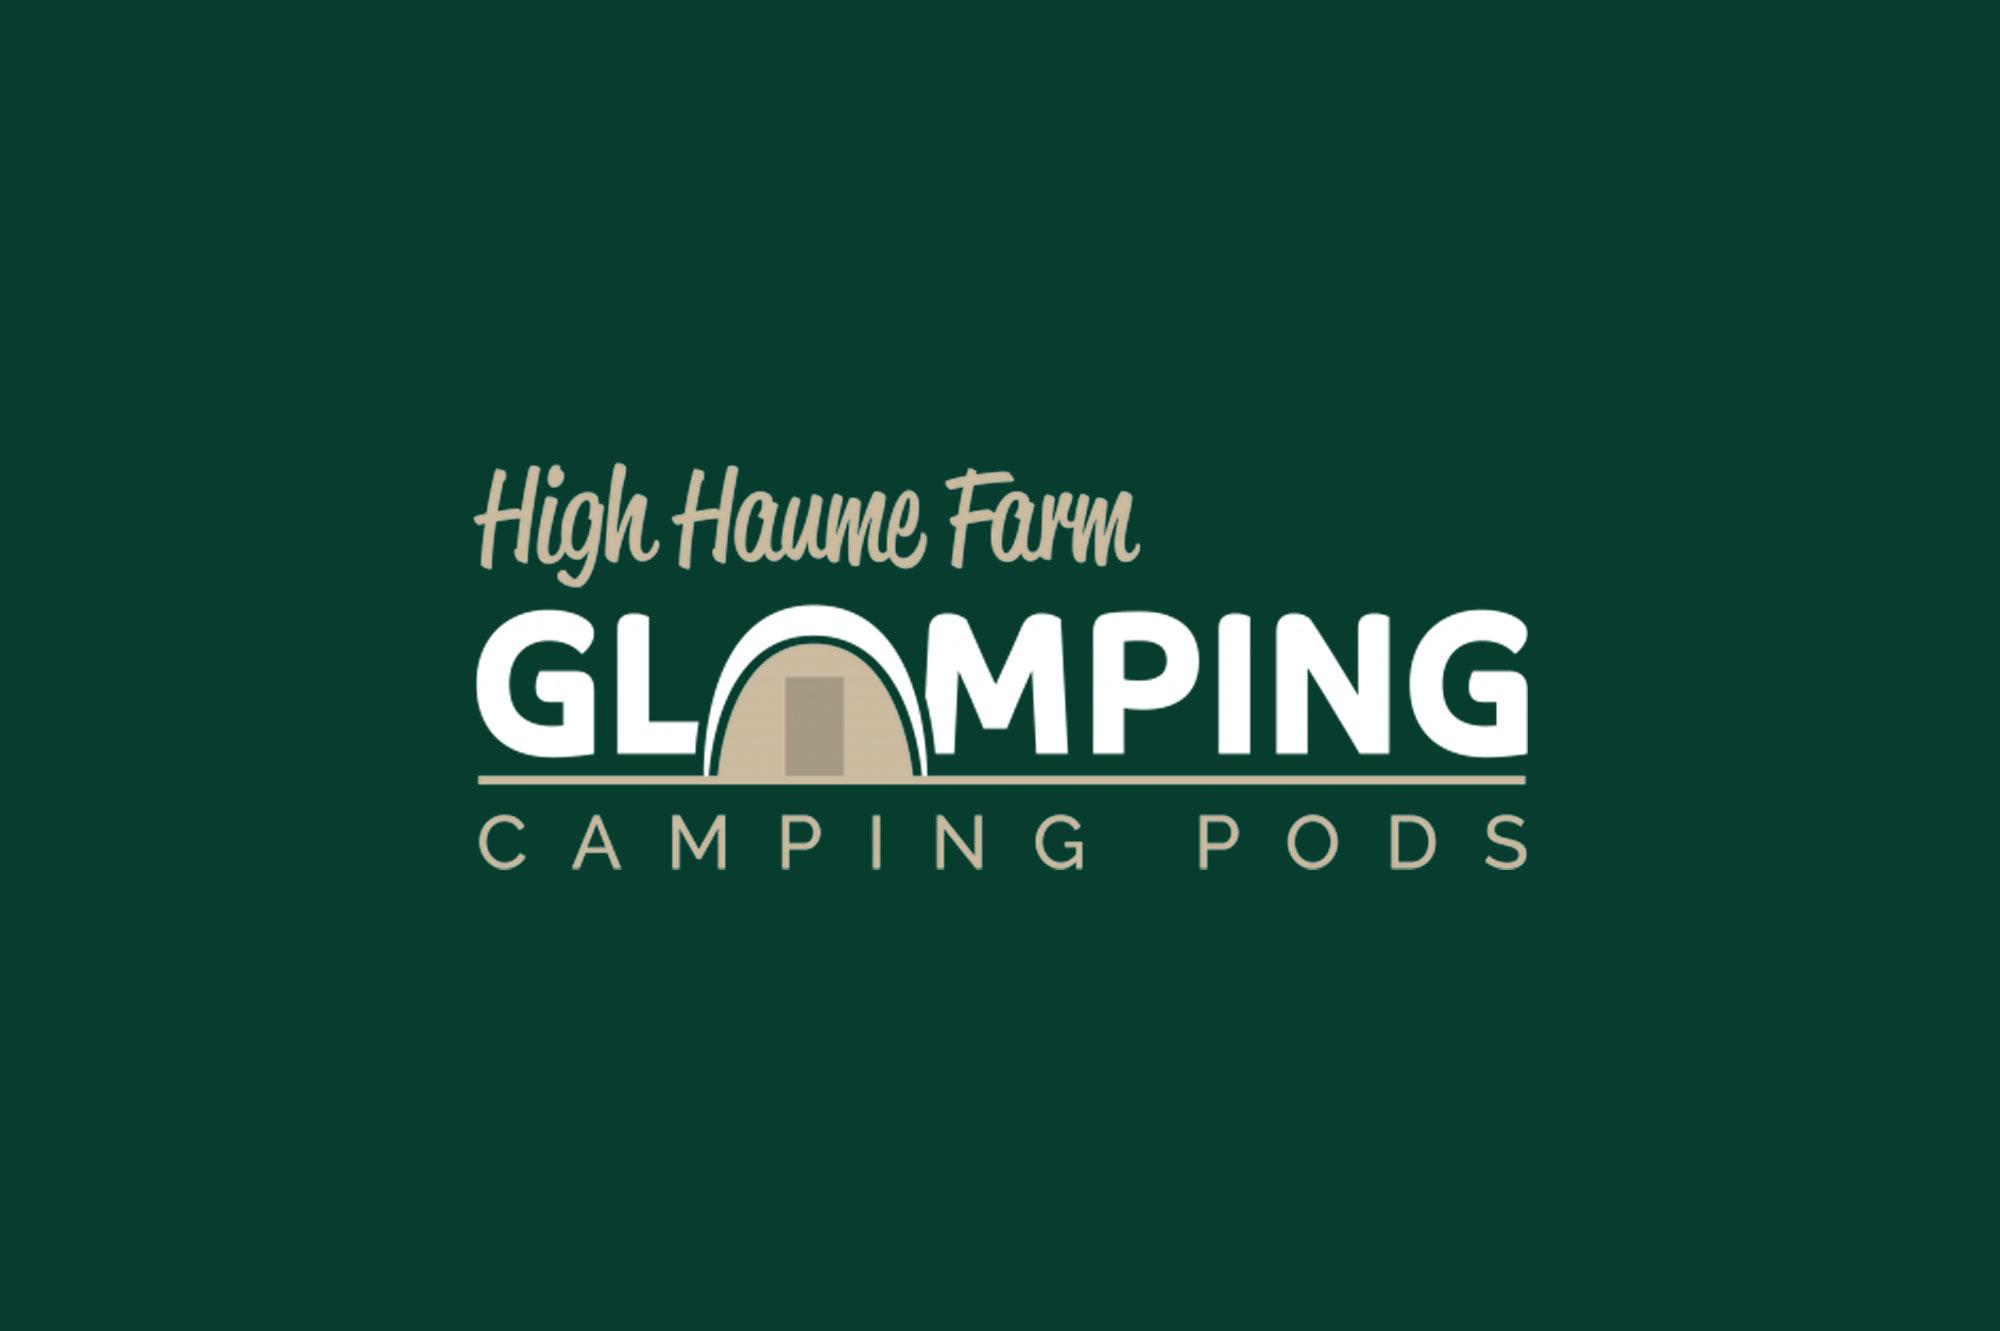 High Haume Farm Glamping logo